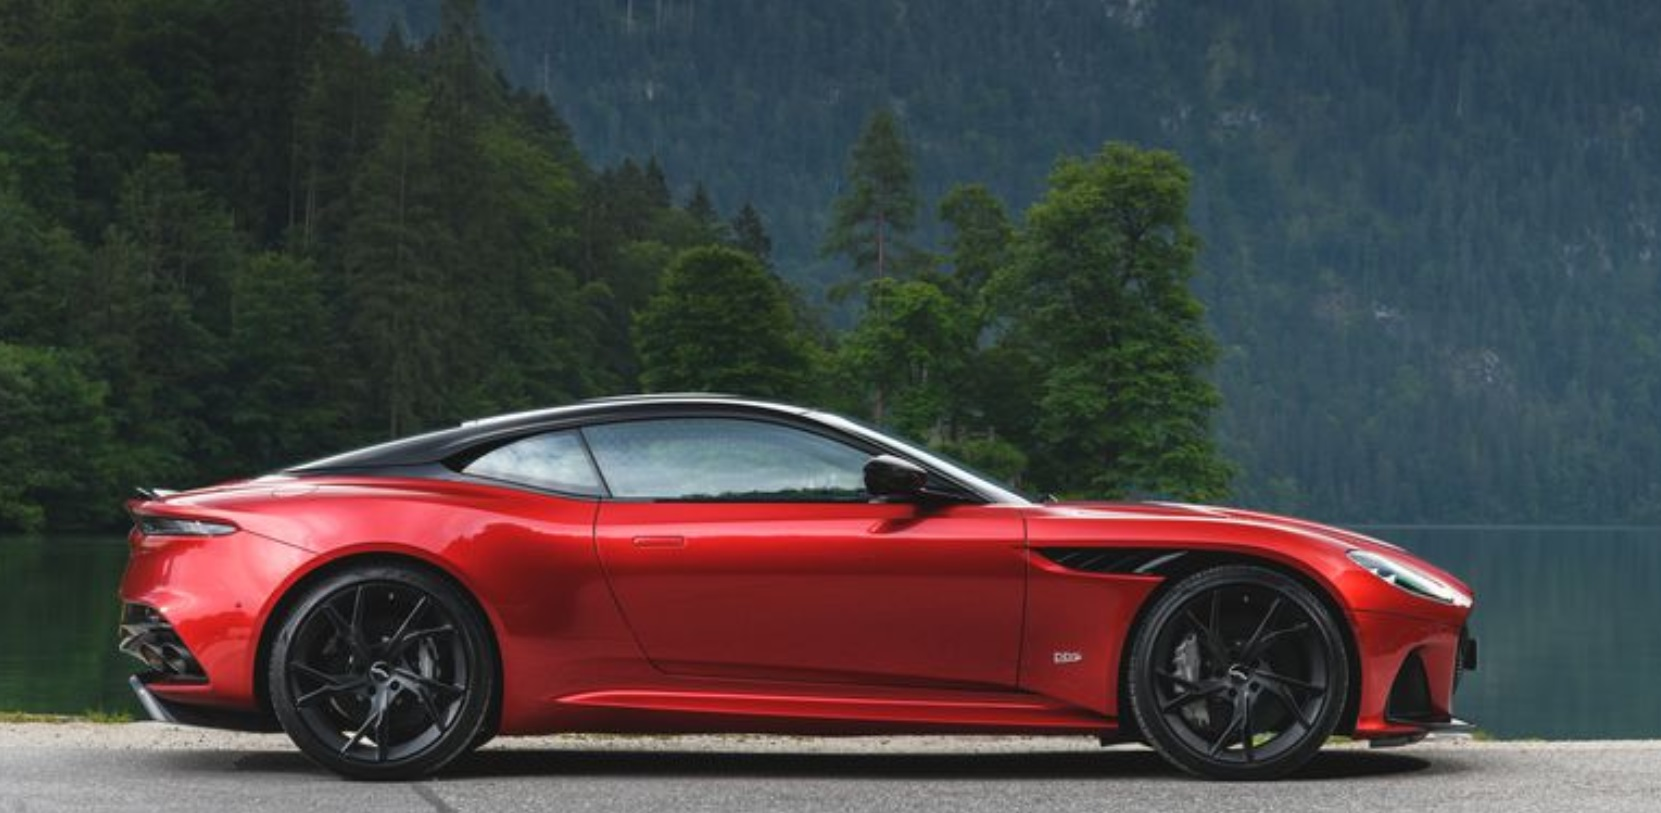 2019 Aston Martin DBS Superleggera Side View